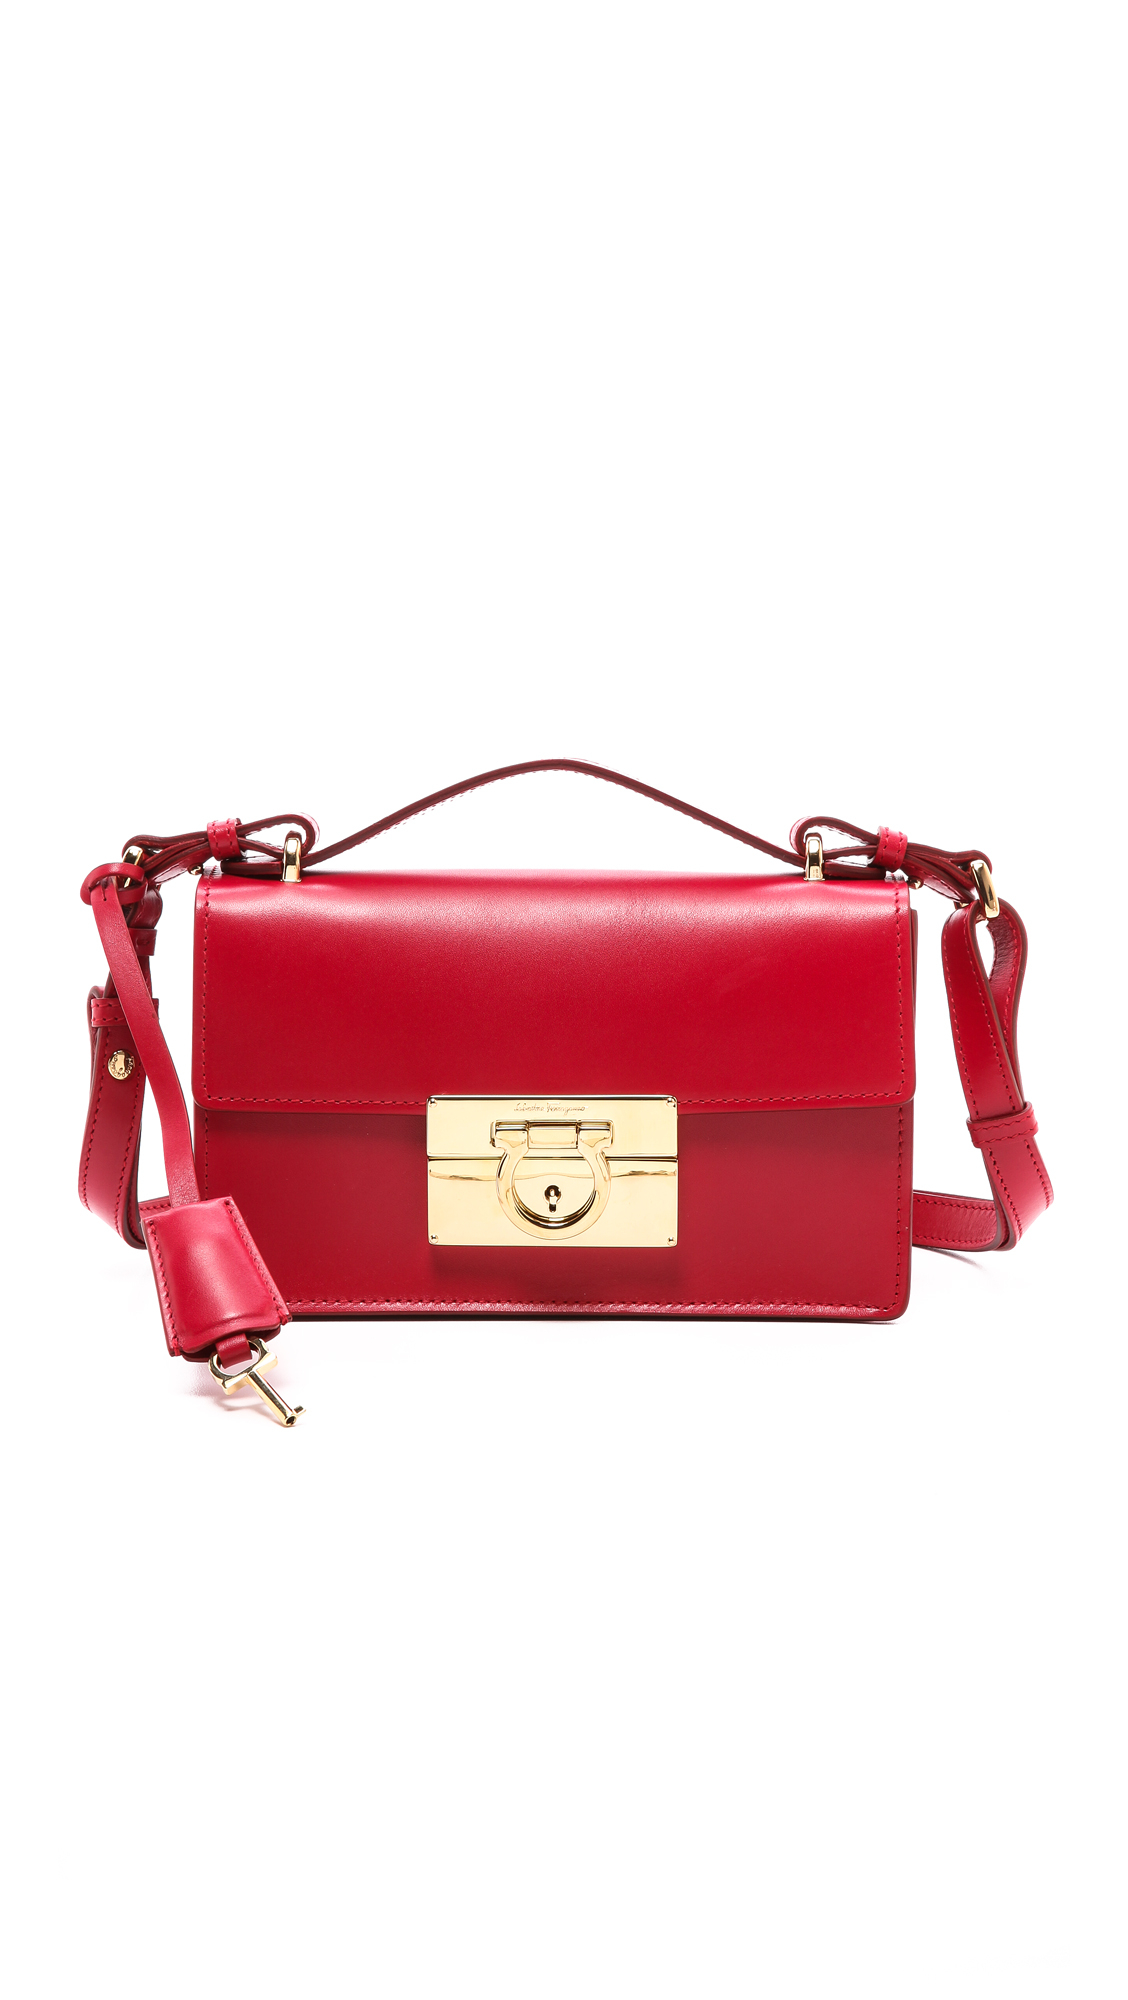 Ferragamo Aileen Shoulder Bag in Red - Lyst 3fad8179c207f